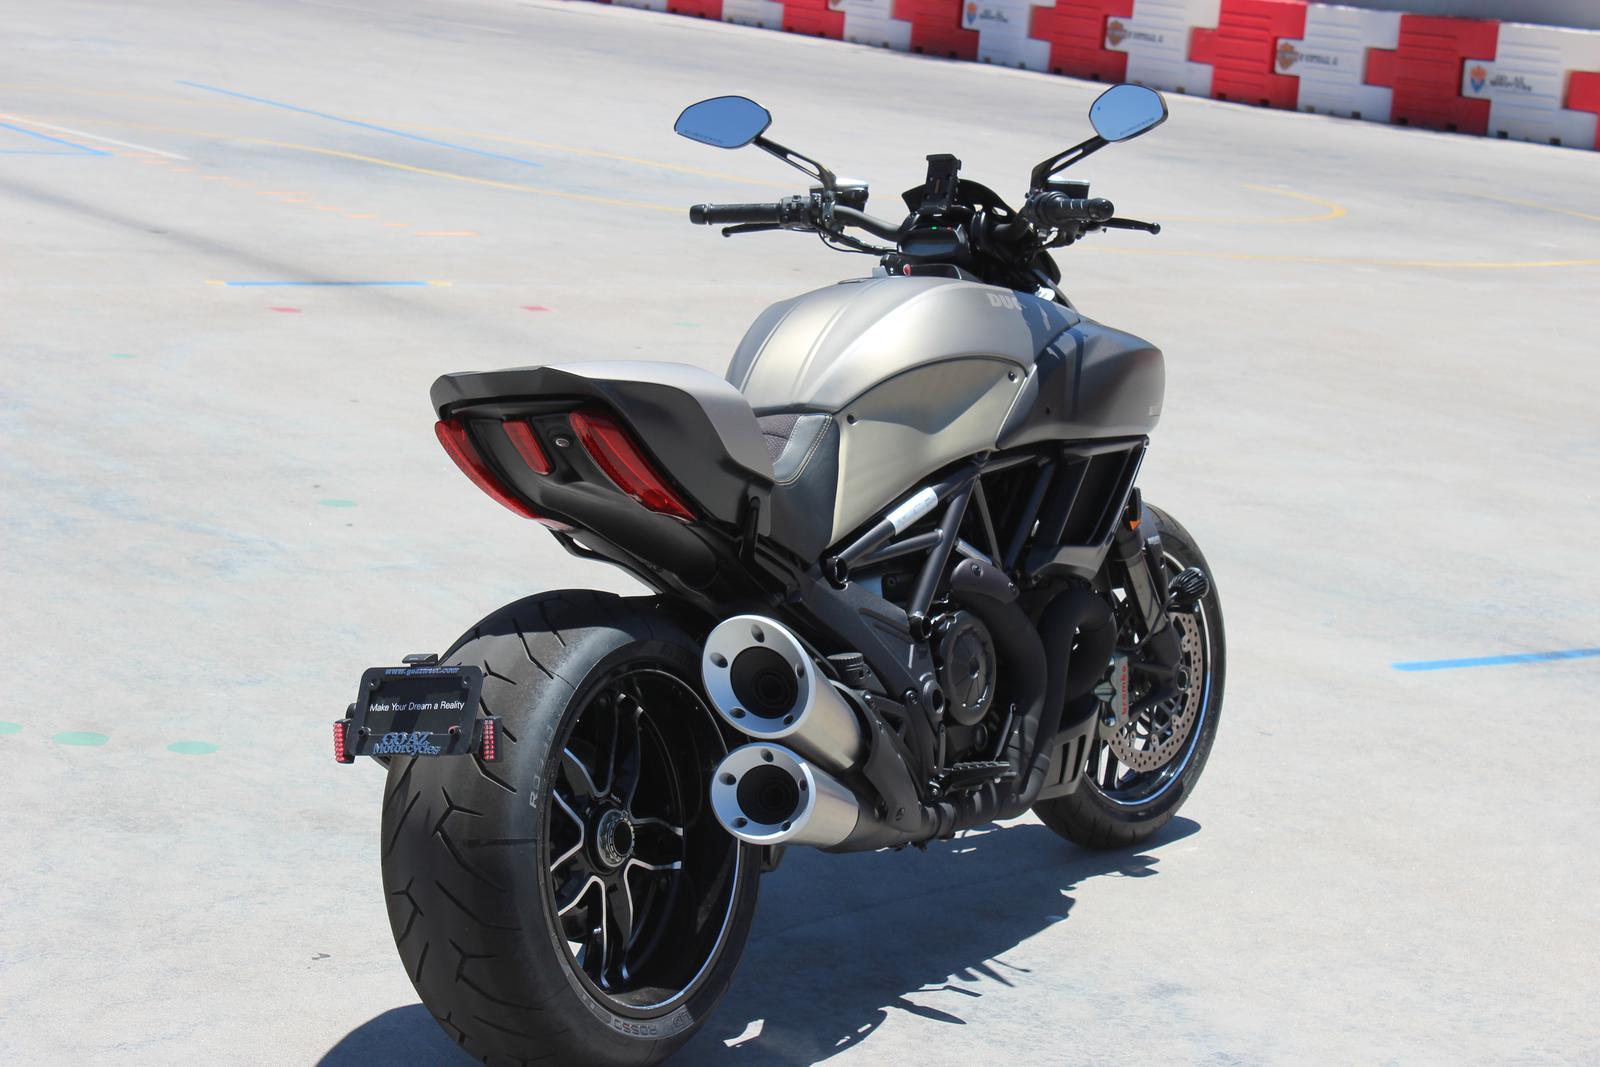 2015 Ducati Diavel Titanium for sale in Scottsdale, AZ. GO AZ ...